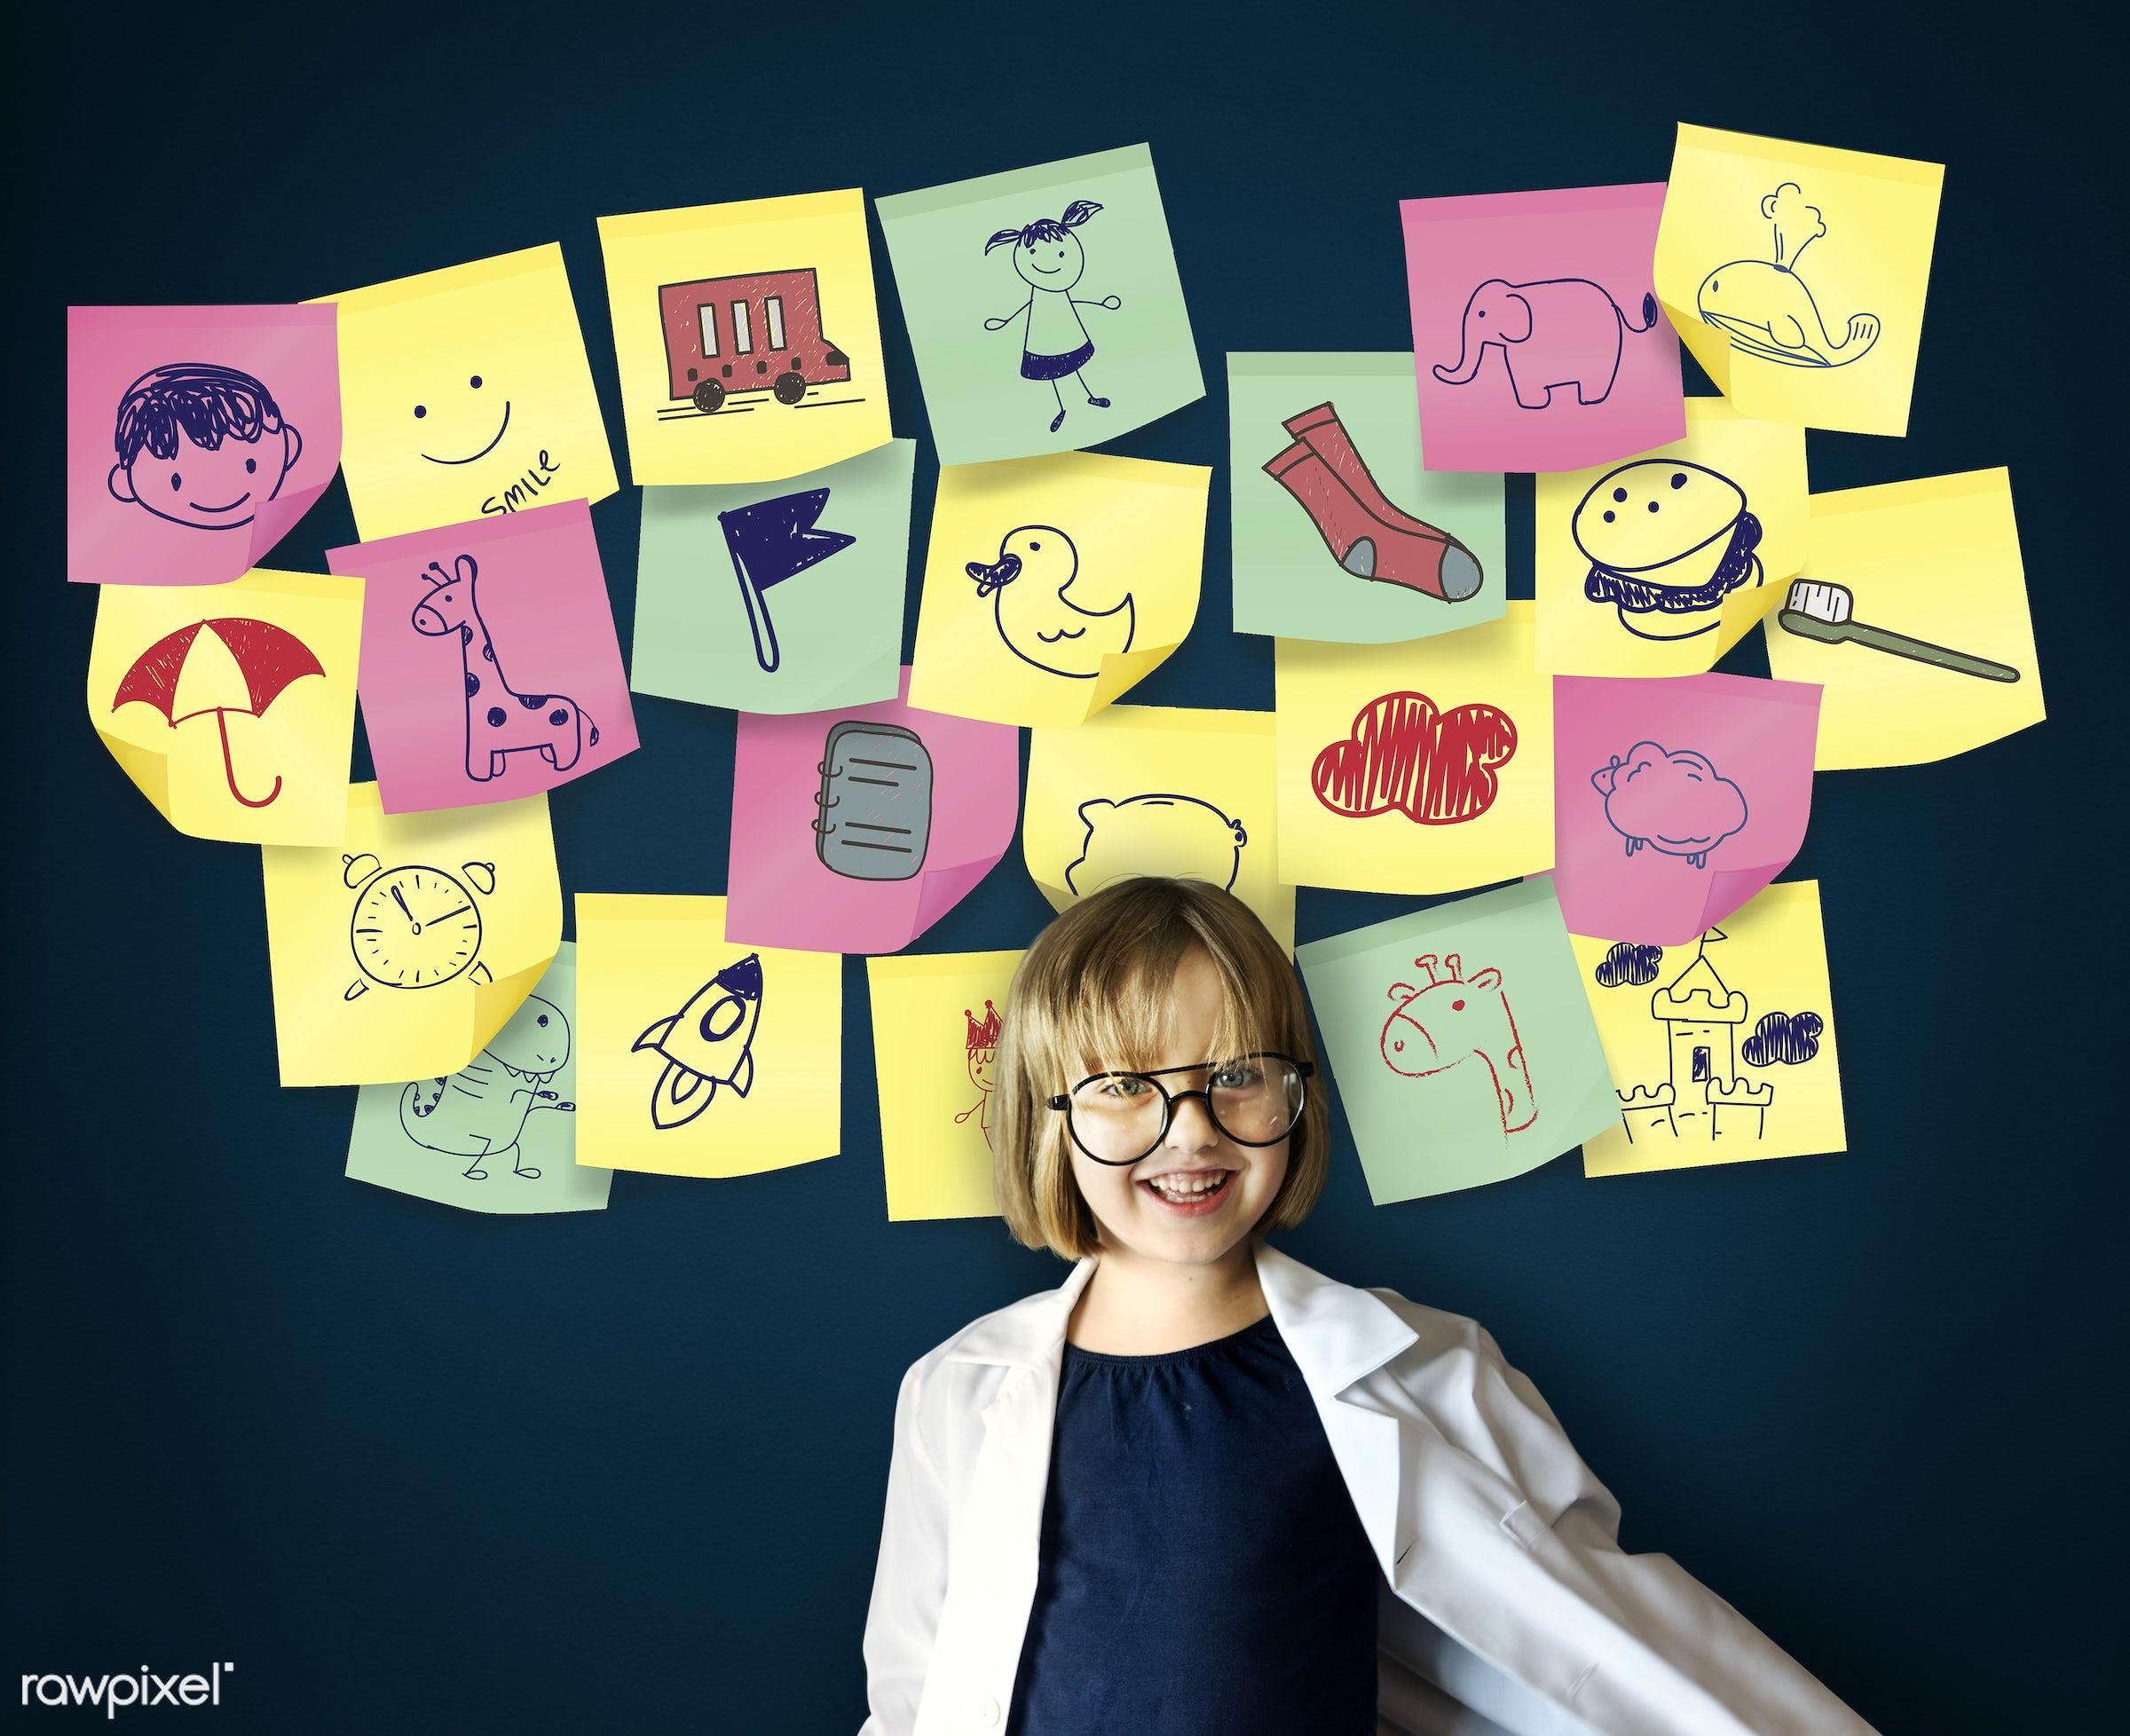 academic, academics, adorable, animals, art, arts and crafts, blackboard, cheerful, child, childhood, children, creative,...